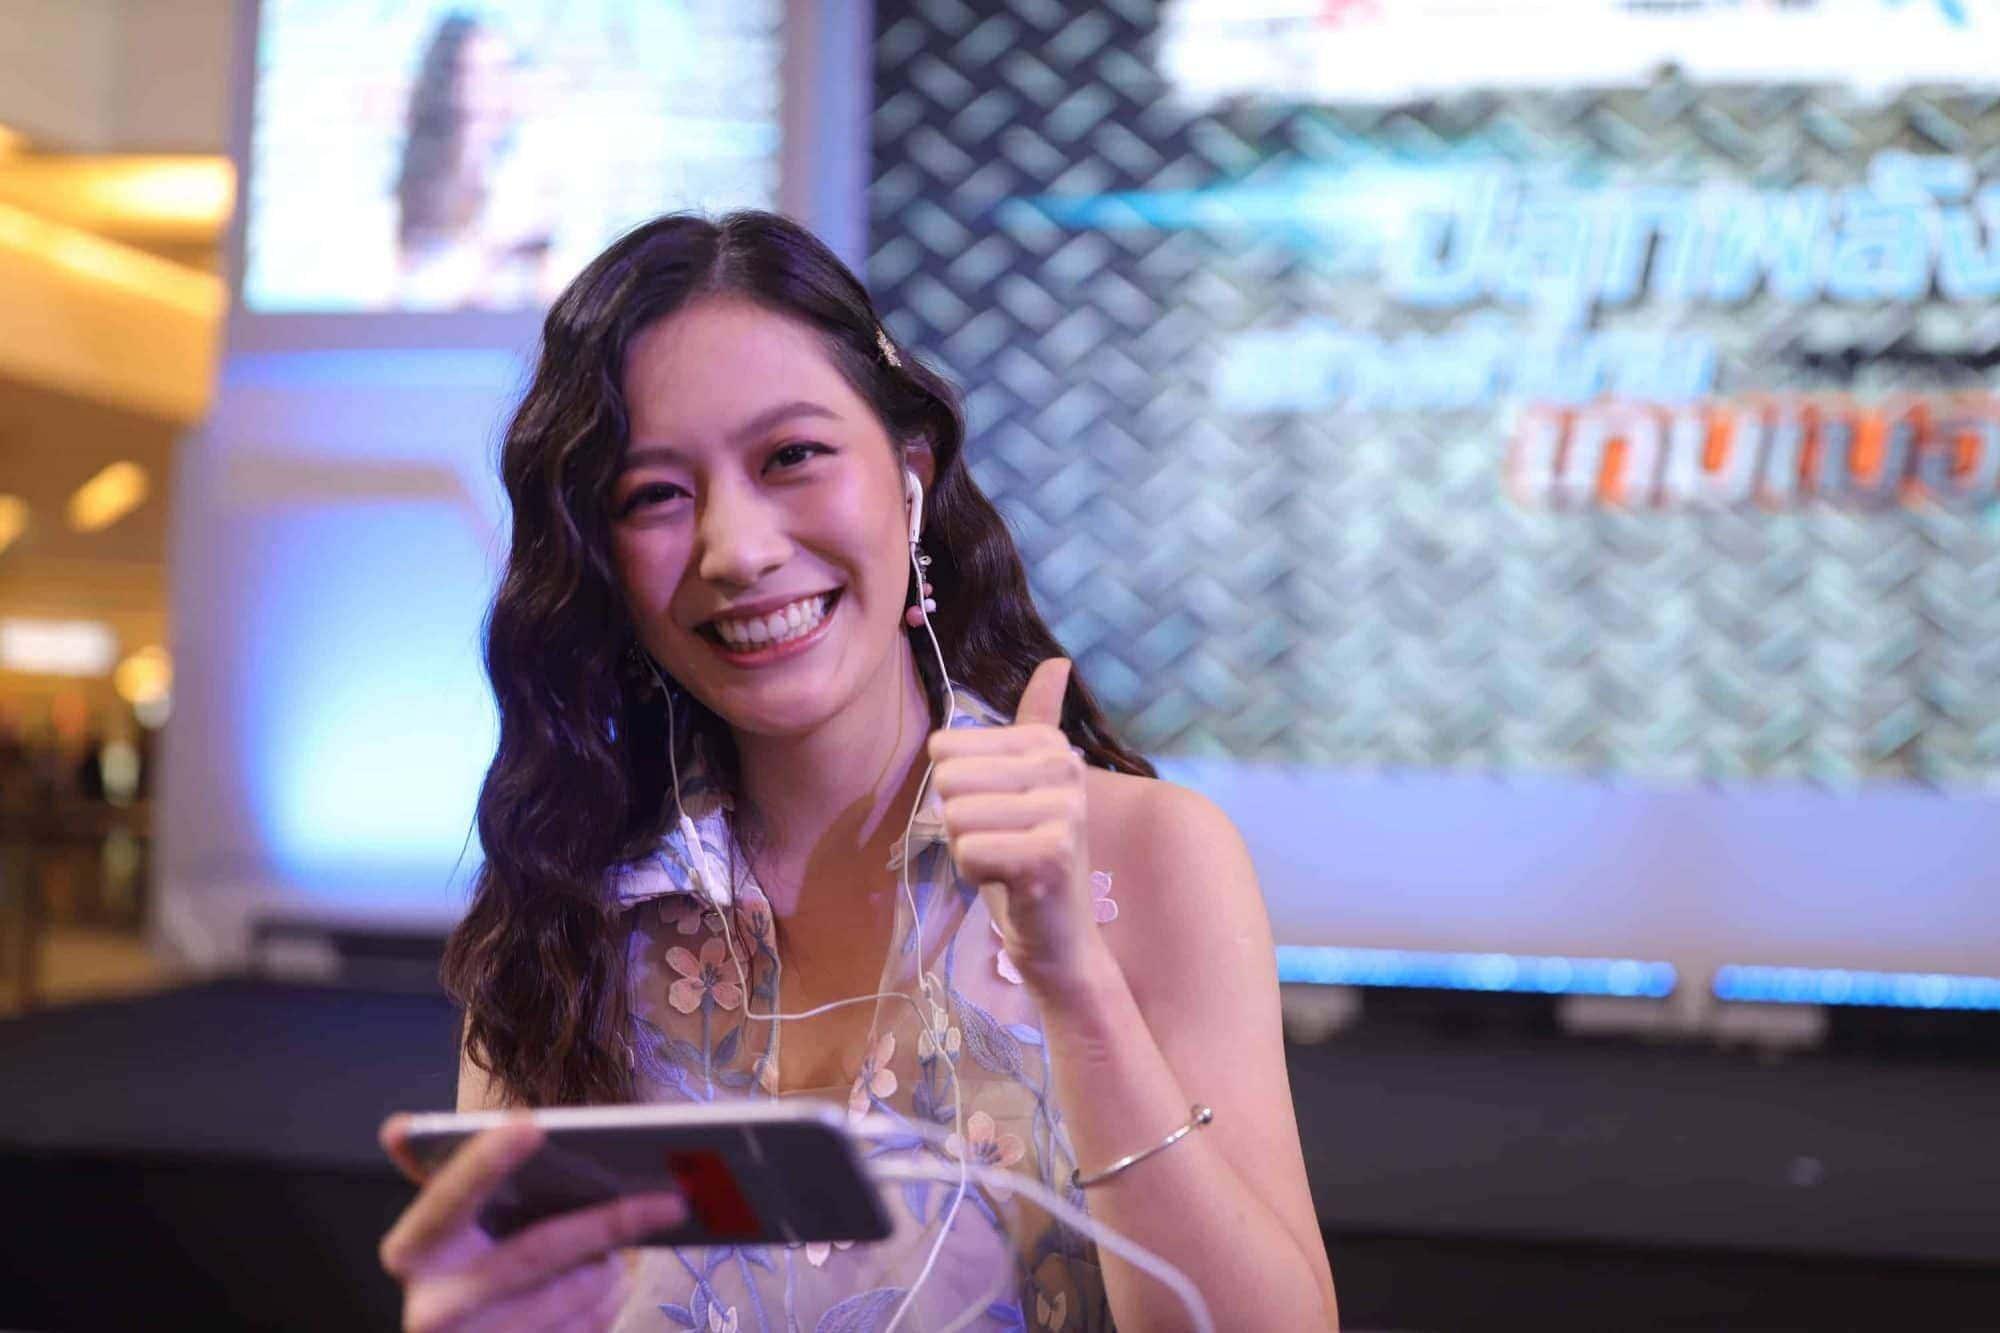 - Garena จับมือ Dtac จัดรายการแข่งขันโปรลีกครั้งแรกสำหรับเกม 'Battle Royale' ในประเทศไทย รายการ 'Free Fire Proleague 2019 Presented by dtac'